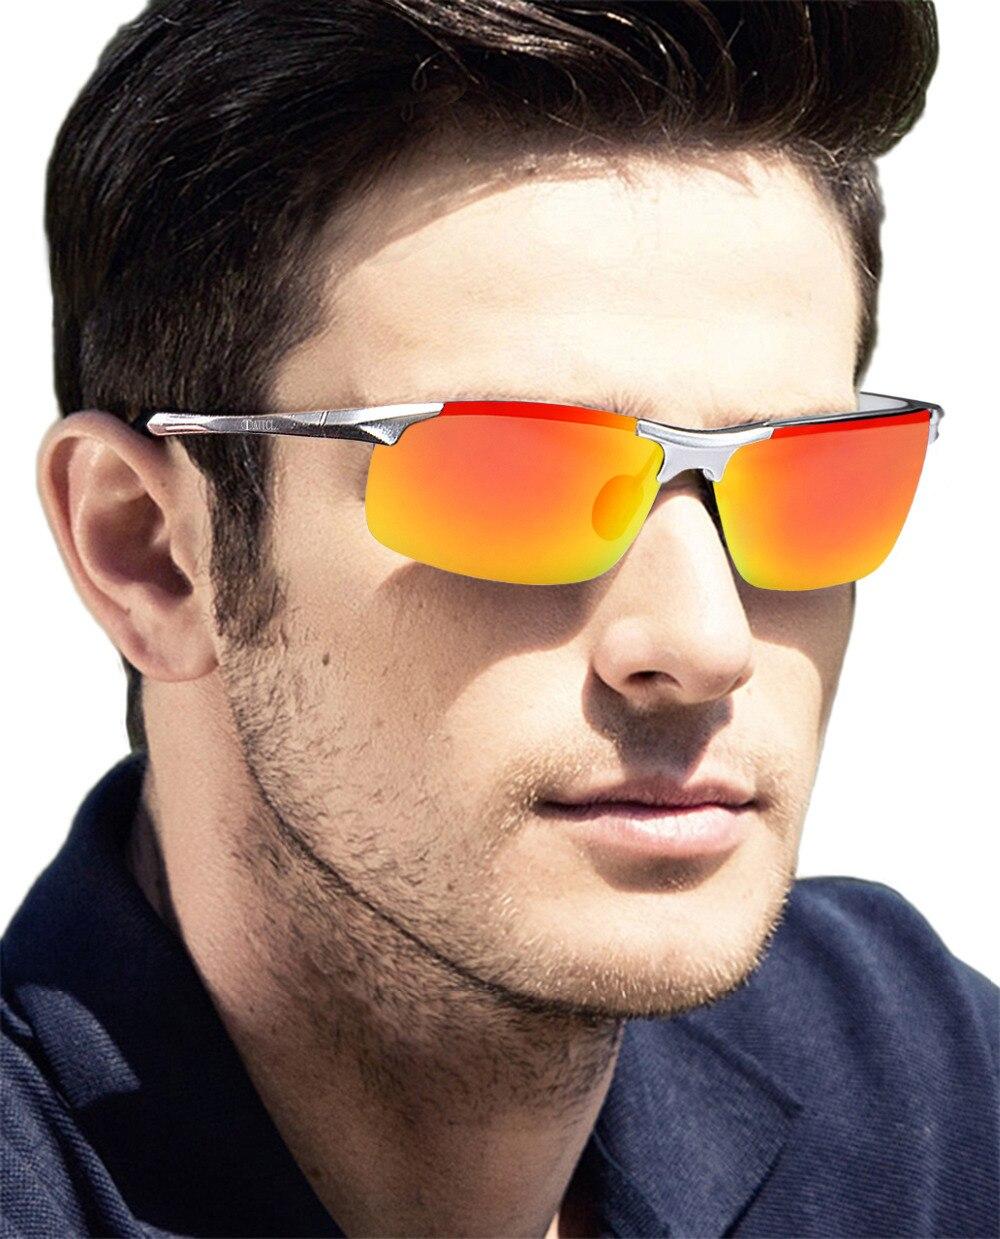 Attcl New Polarized Sunglasses For Men 2015 Fashion Driving lJcu1FTK3